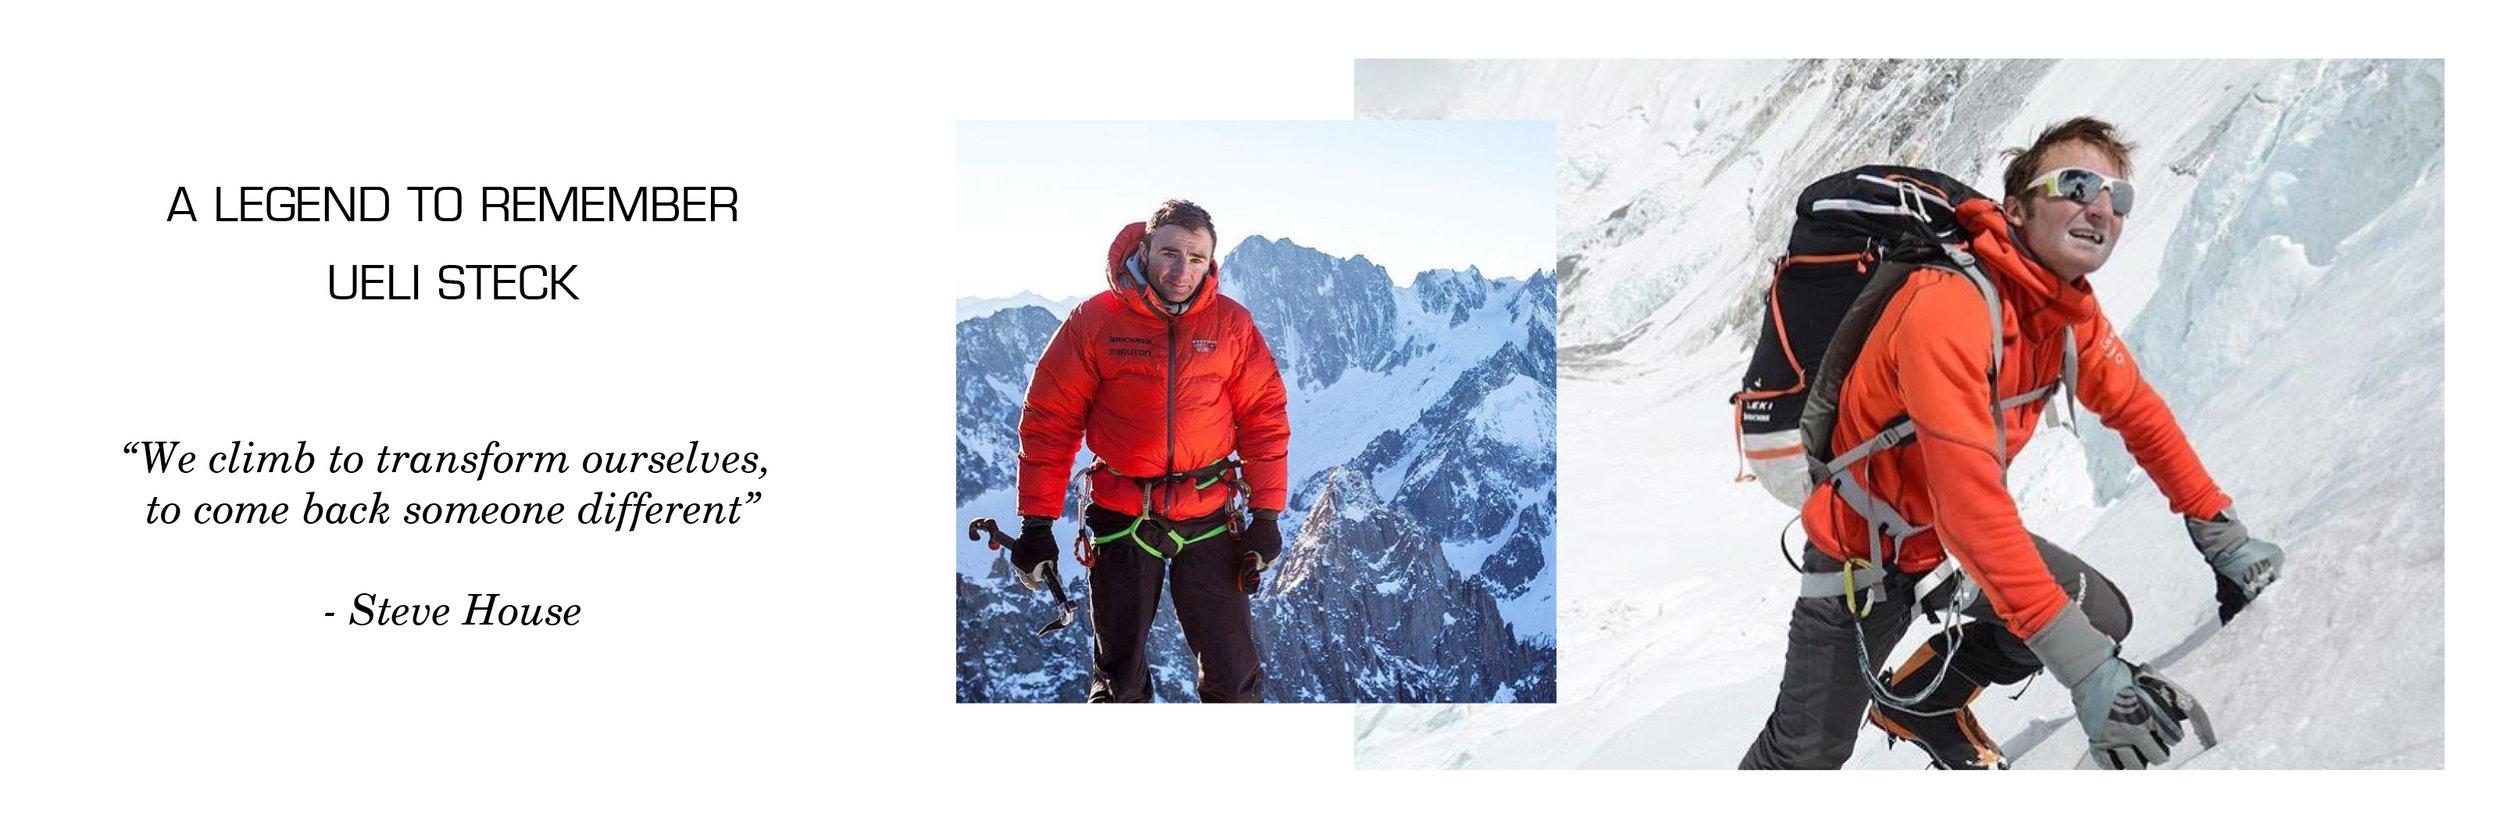 Ueli Steck Alpinist